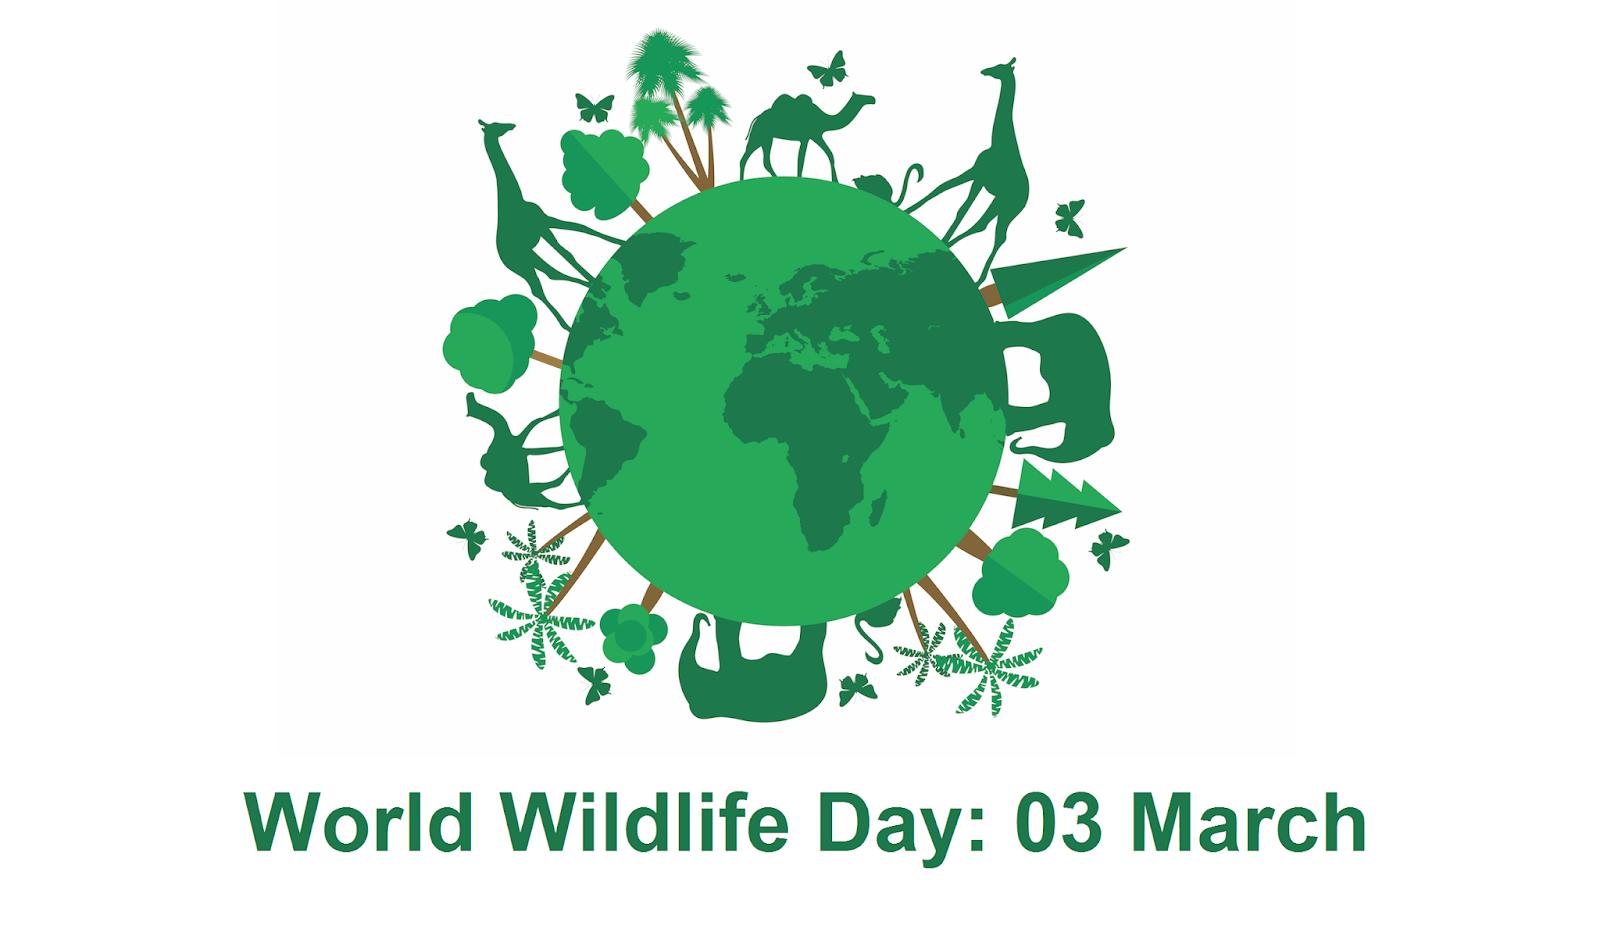 3rd March - World Wildlife Day: Social Media Holidays